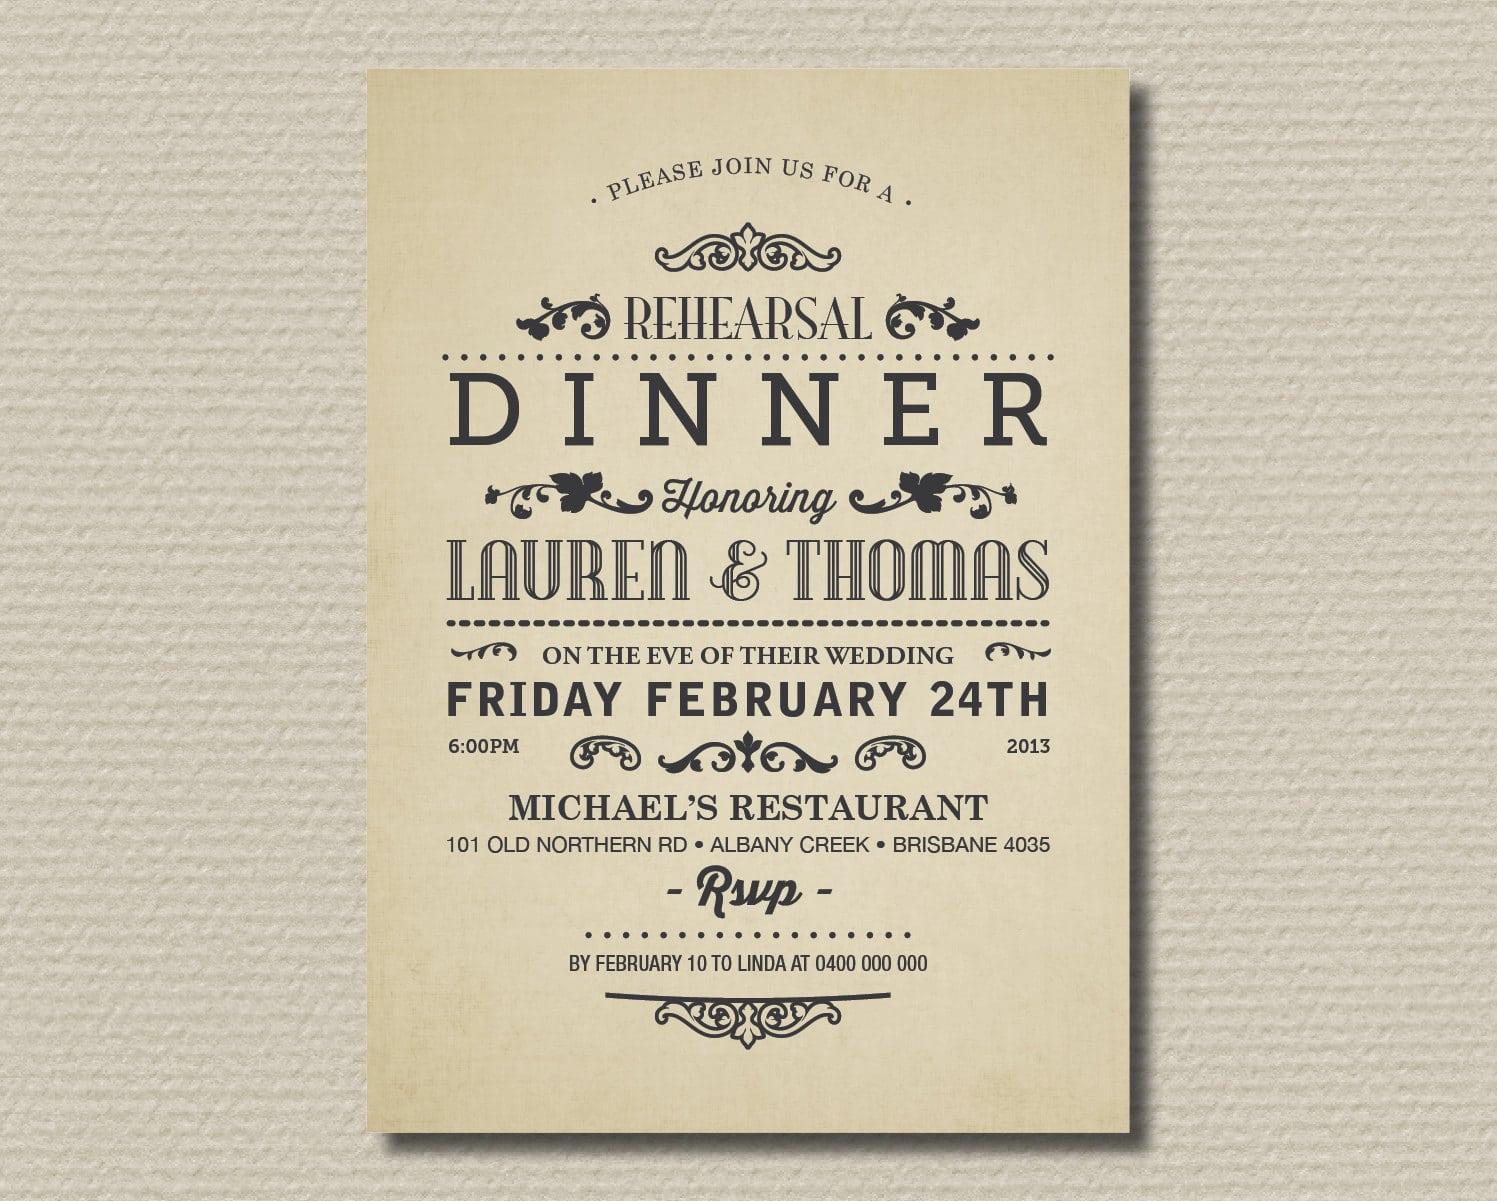 Vintage Appreciation Dinner Invitation Design With Cream